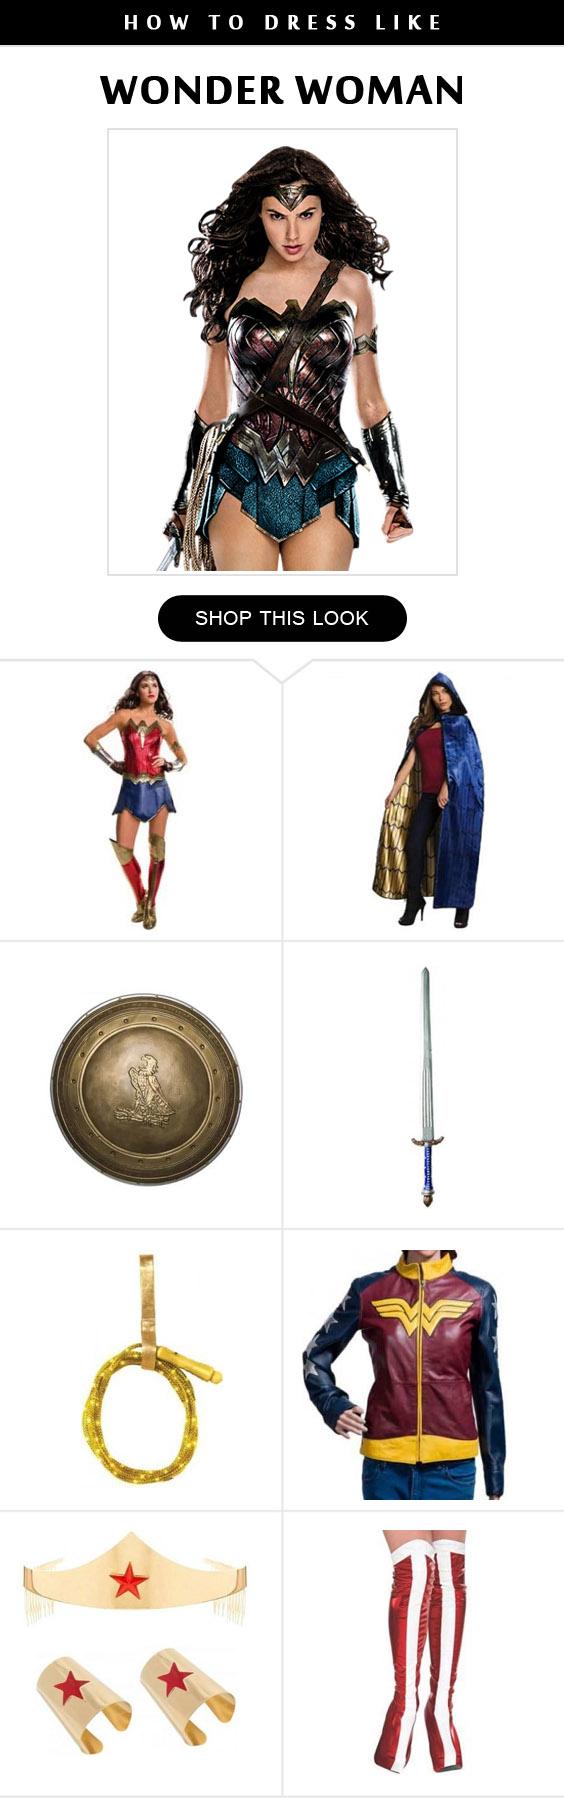 Wonder Woman Costume Infographic